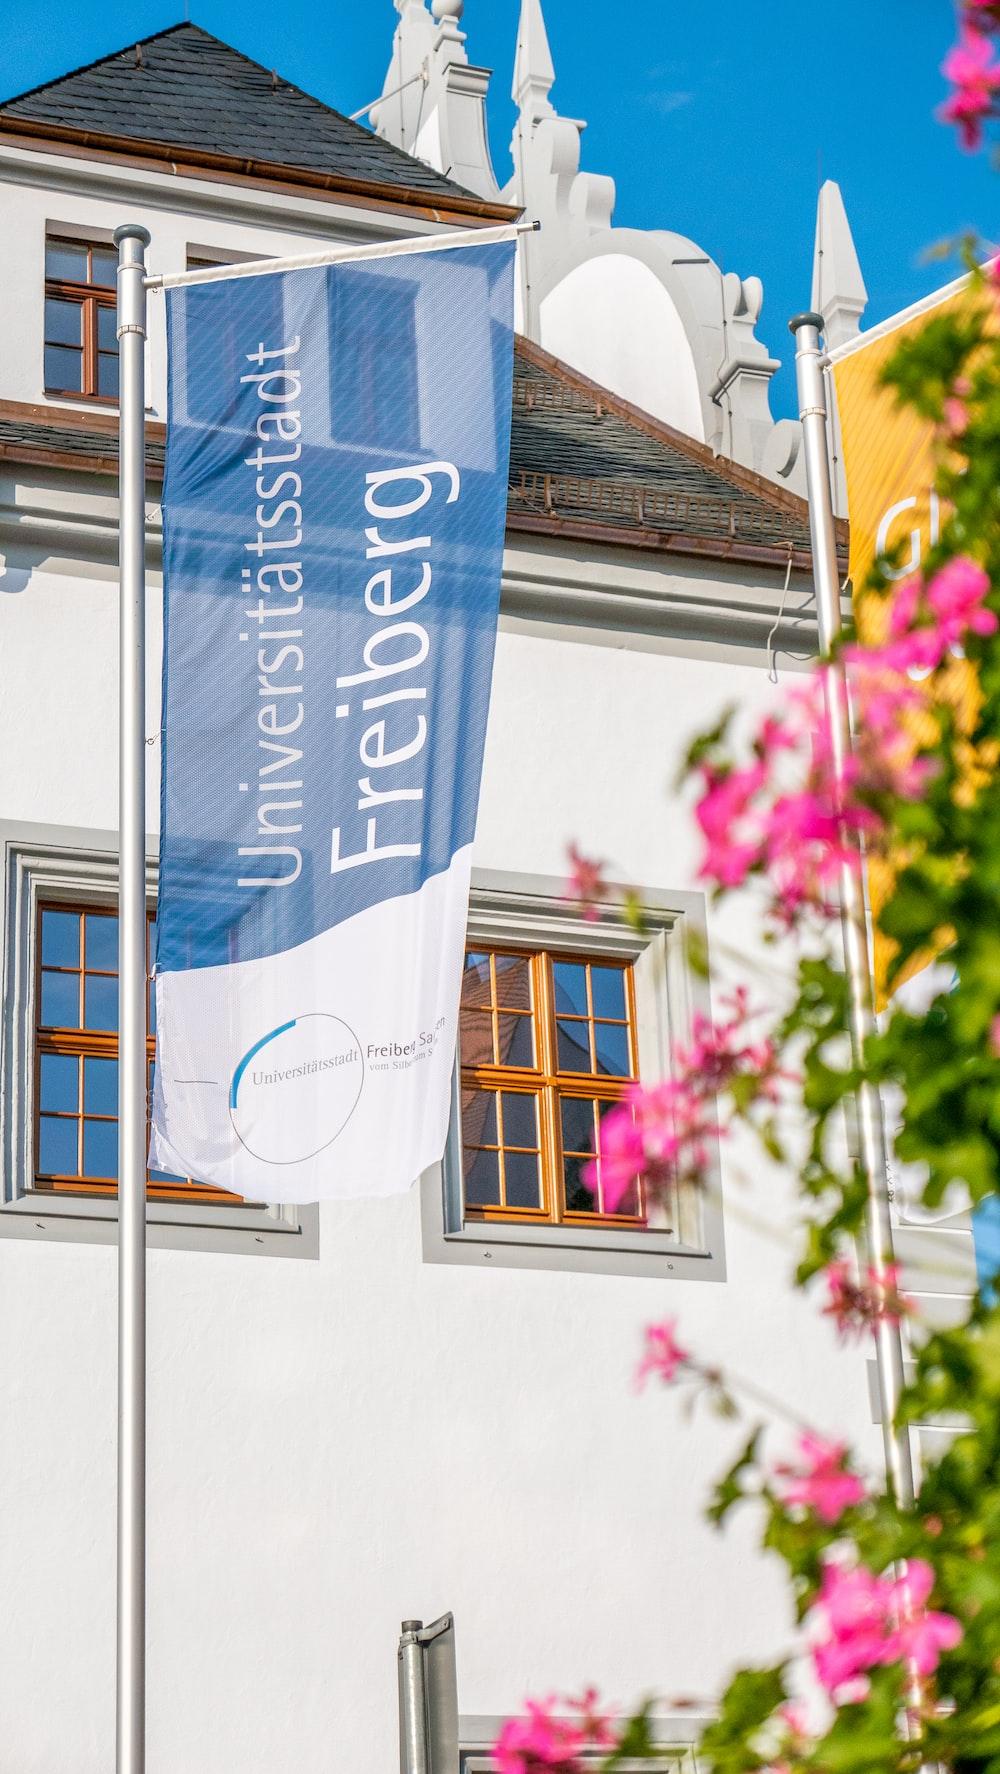 Freigberg flag